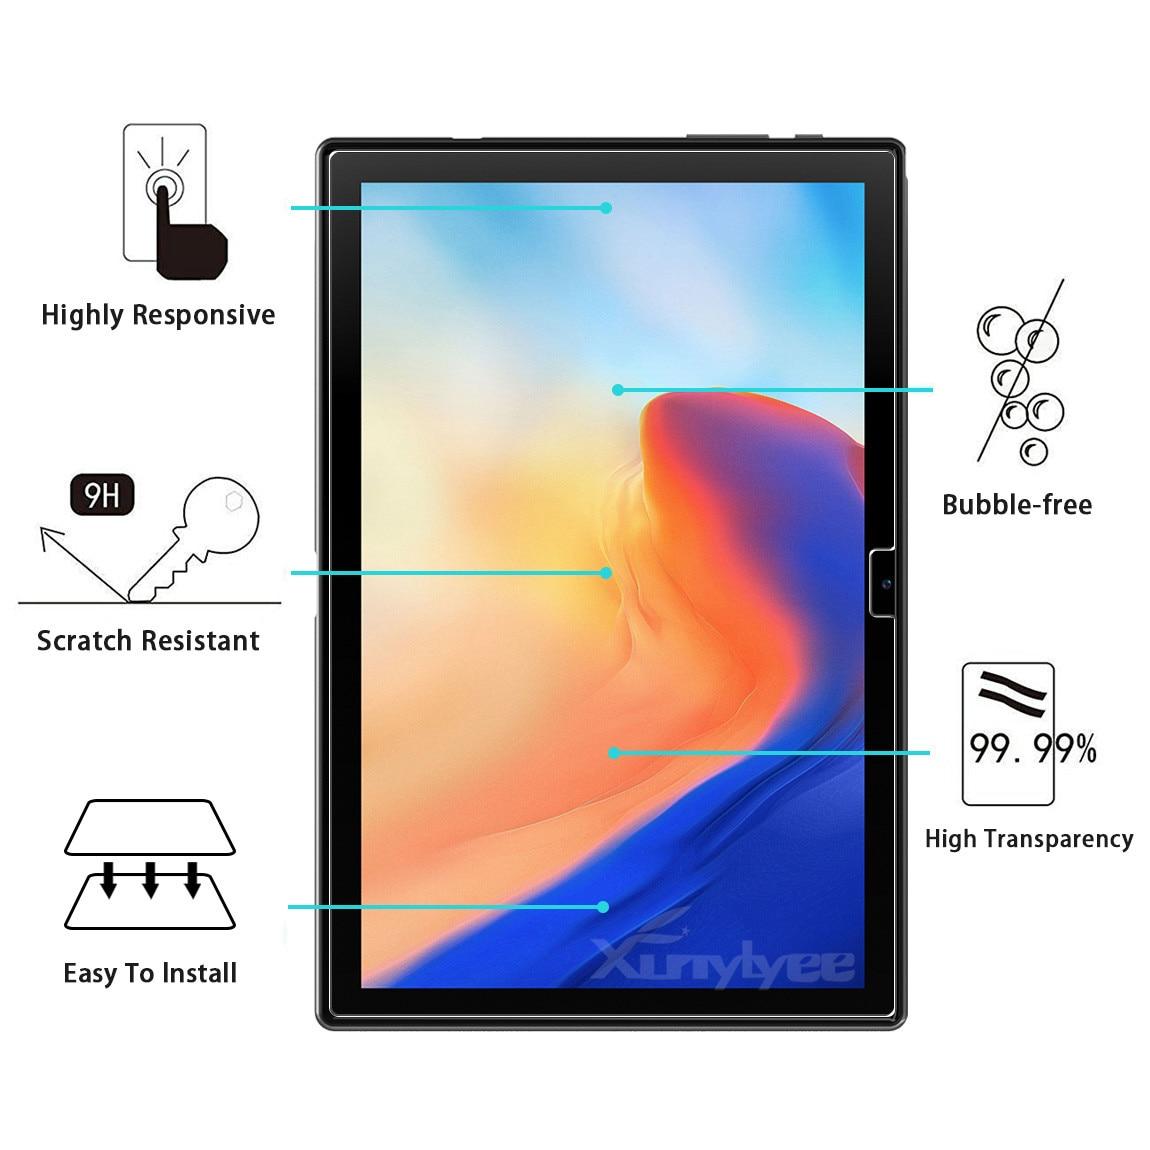 Защита для экрана для Blackview Tab 8, защитная пленка для планшета, закаленное стекло для Blackview Tab 8 / Blackview Tab 8E (10,1 дюйма)